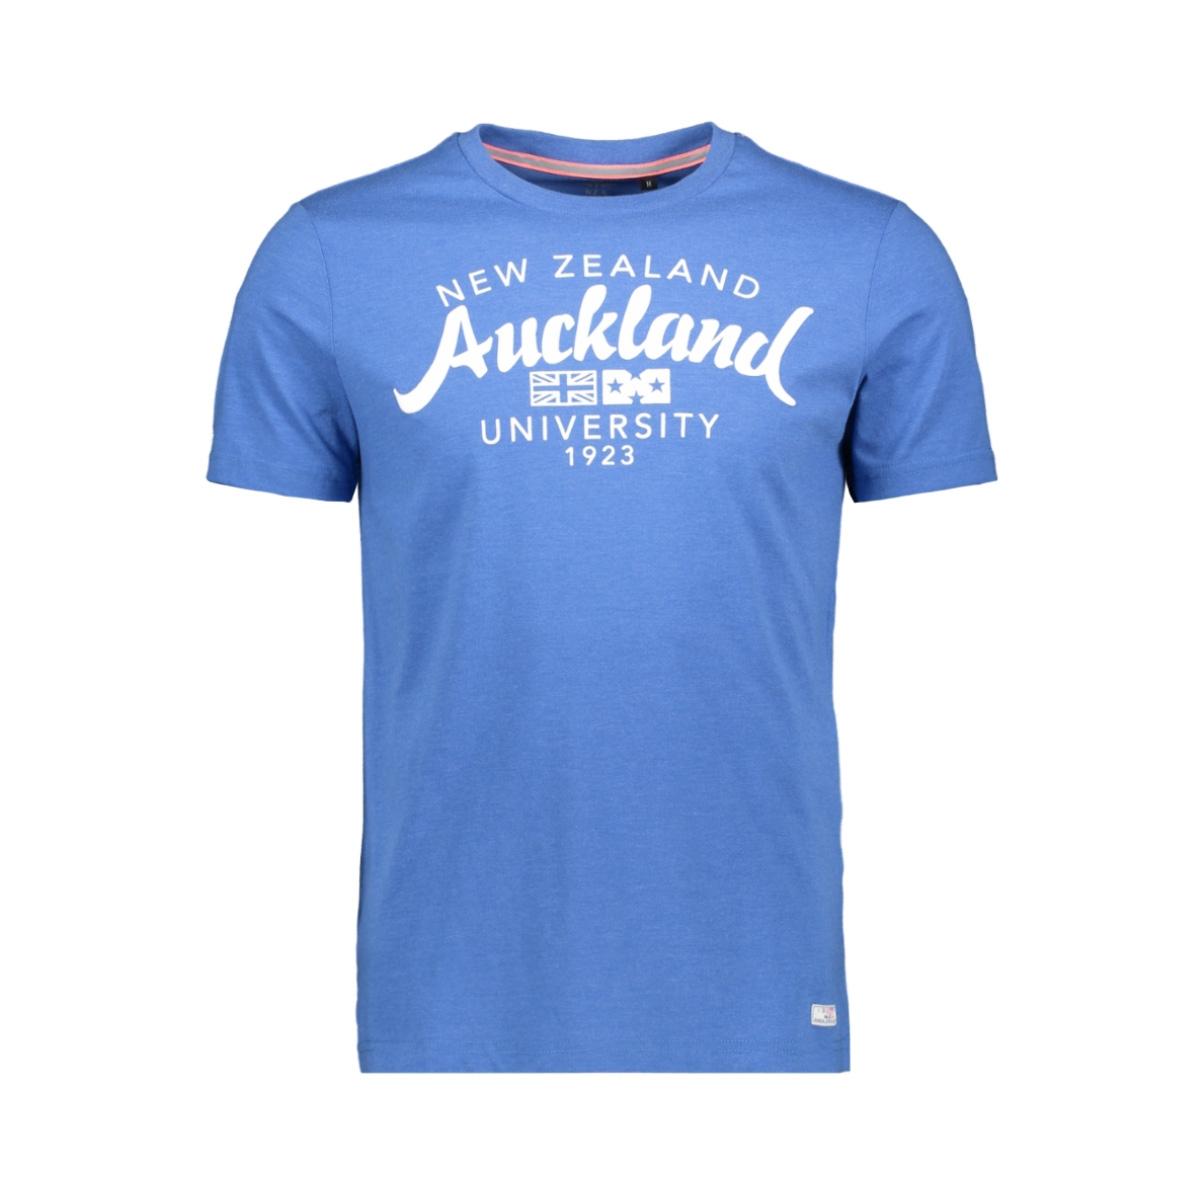 taupo 19cn703 nza t-shirt 292 spring sky